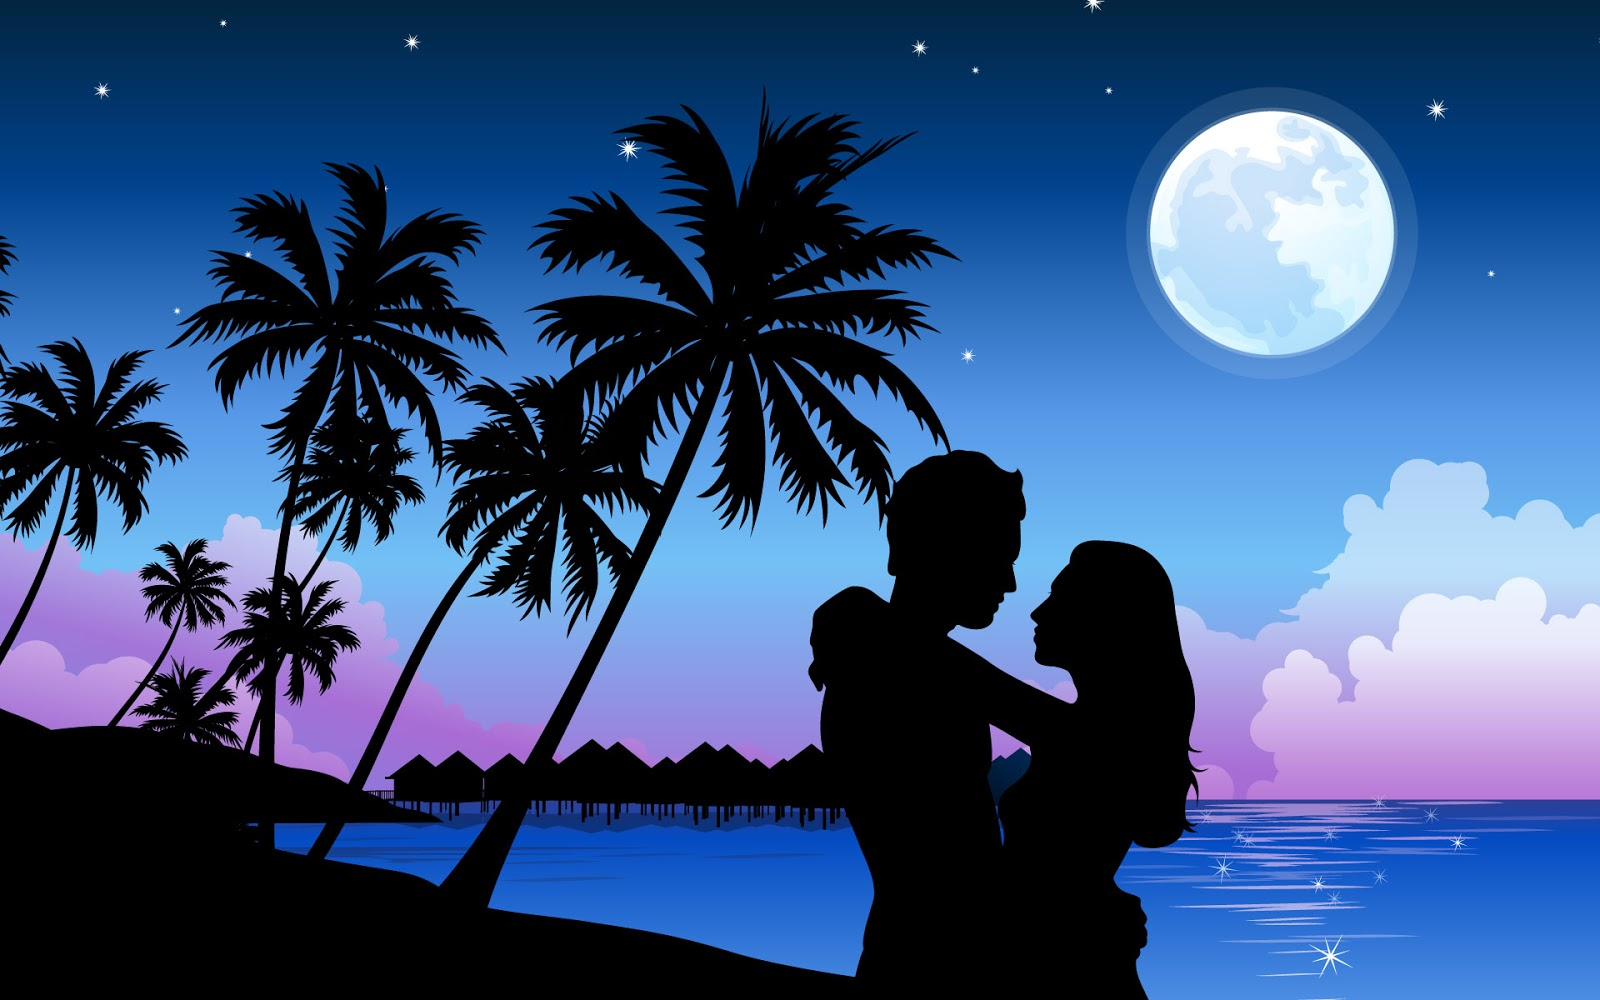 http://3.bp.blogspot.com/-UcfXTMXzgSQ/UTjCHHbID6I/AAAAAAAATcE/l-Leb8s8sx8/s1600/couple-love-romantic-paradise-369167.jpg